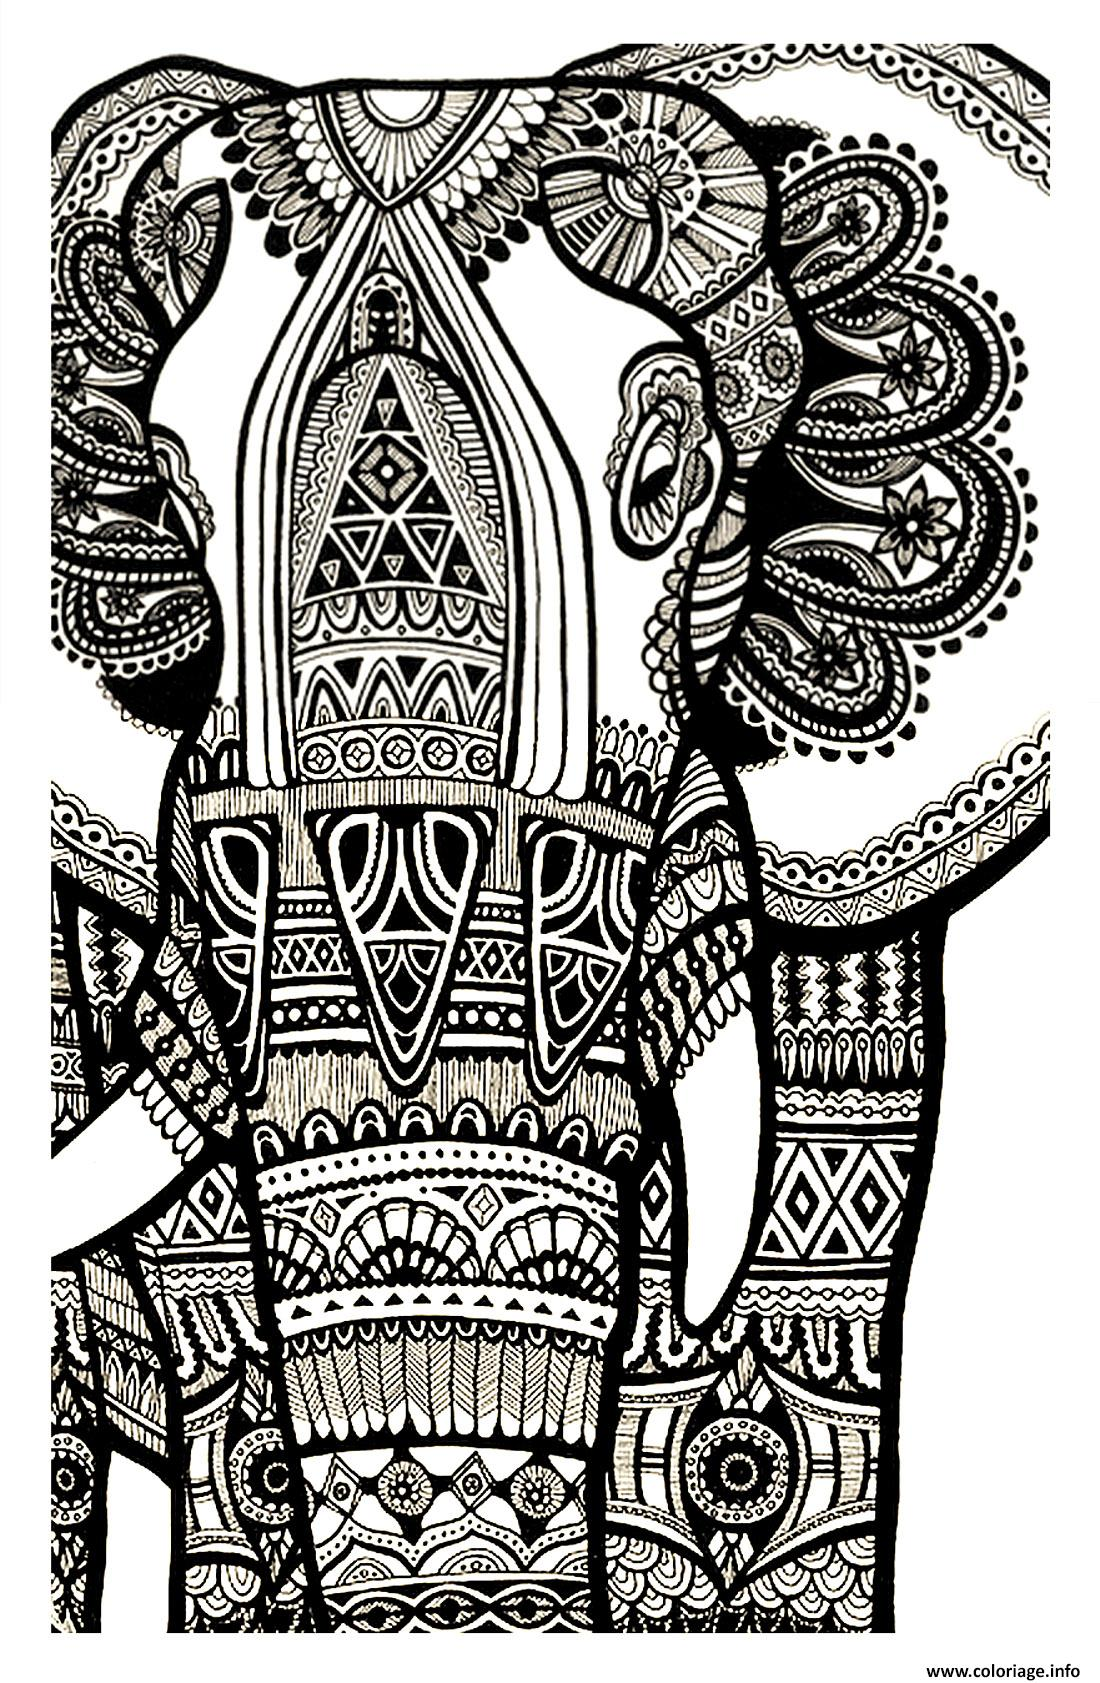 Coloriage Elephant Mandala A Imprimer Gratuit.Coloriage Elephant Gratuit Adulte Dessin